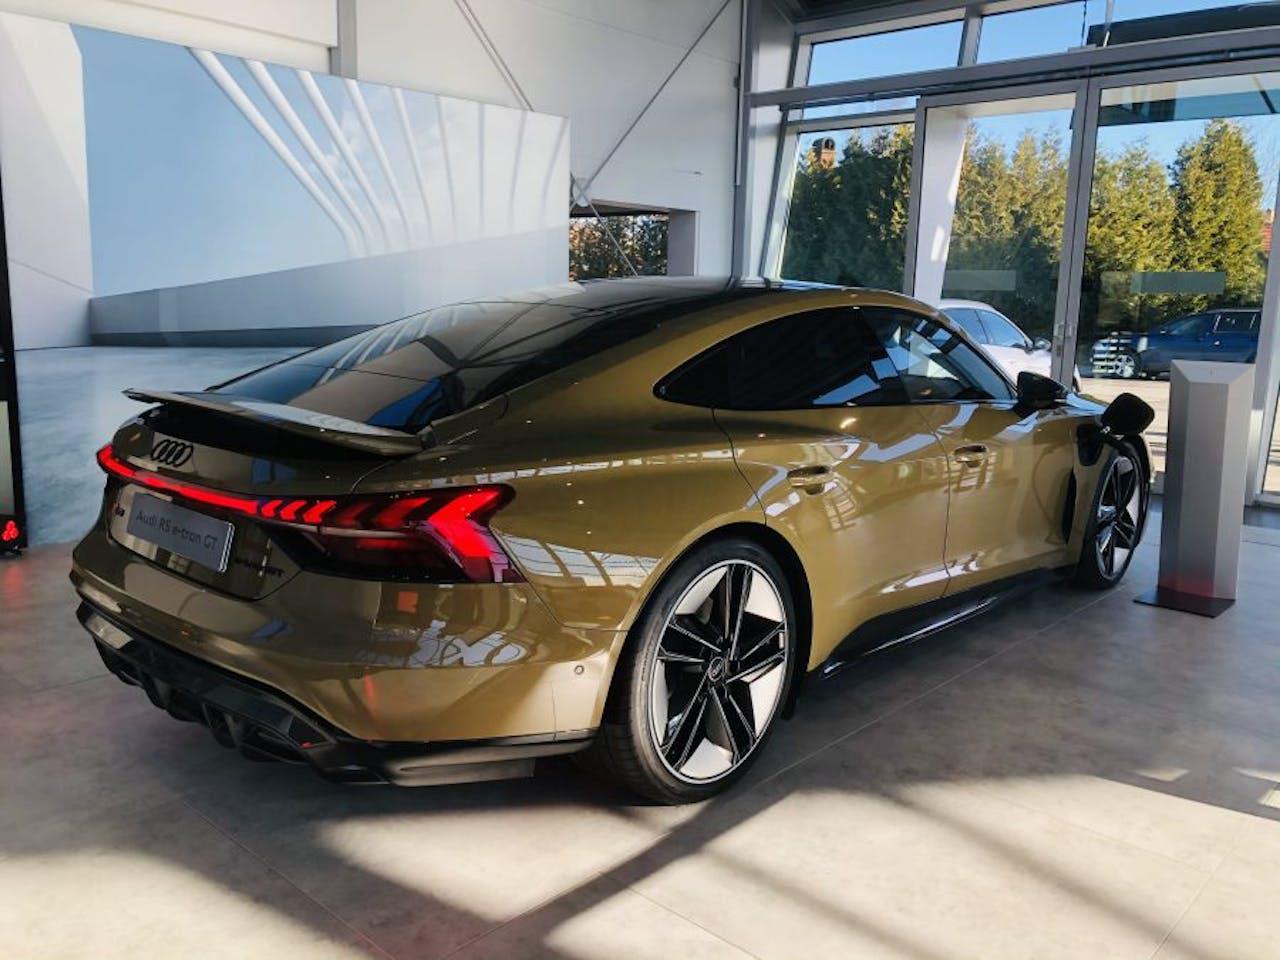 Audi e-tron GT RS in Bronze seitliche Ansicht